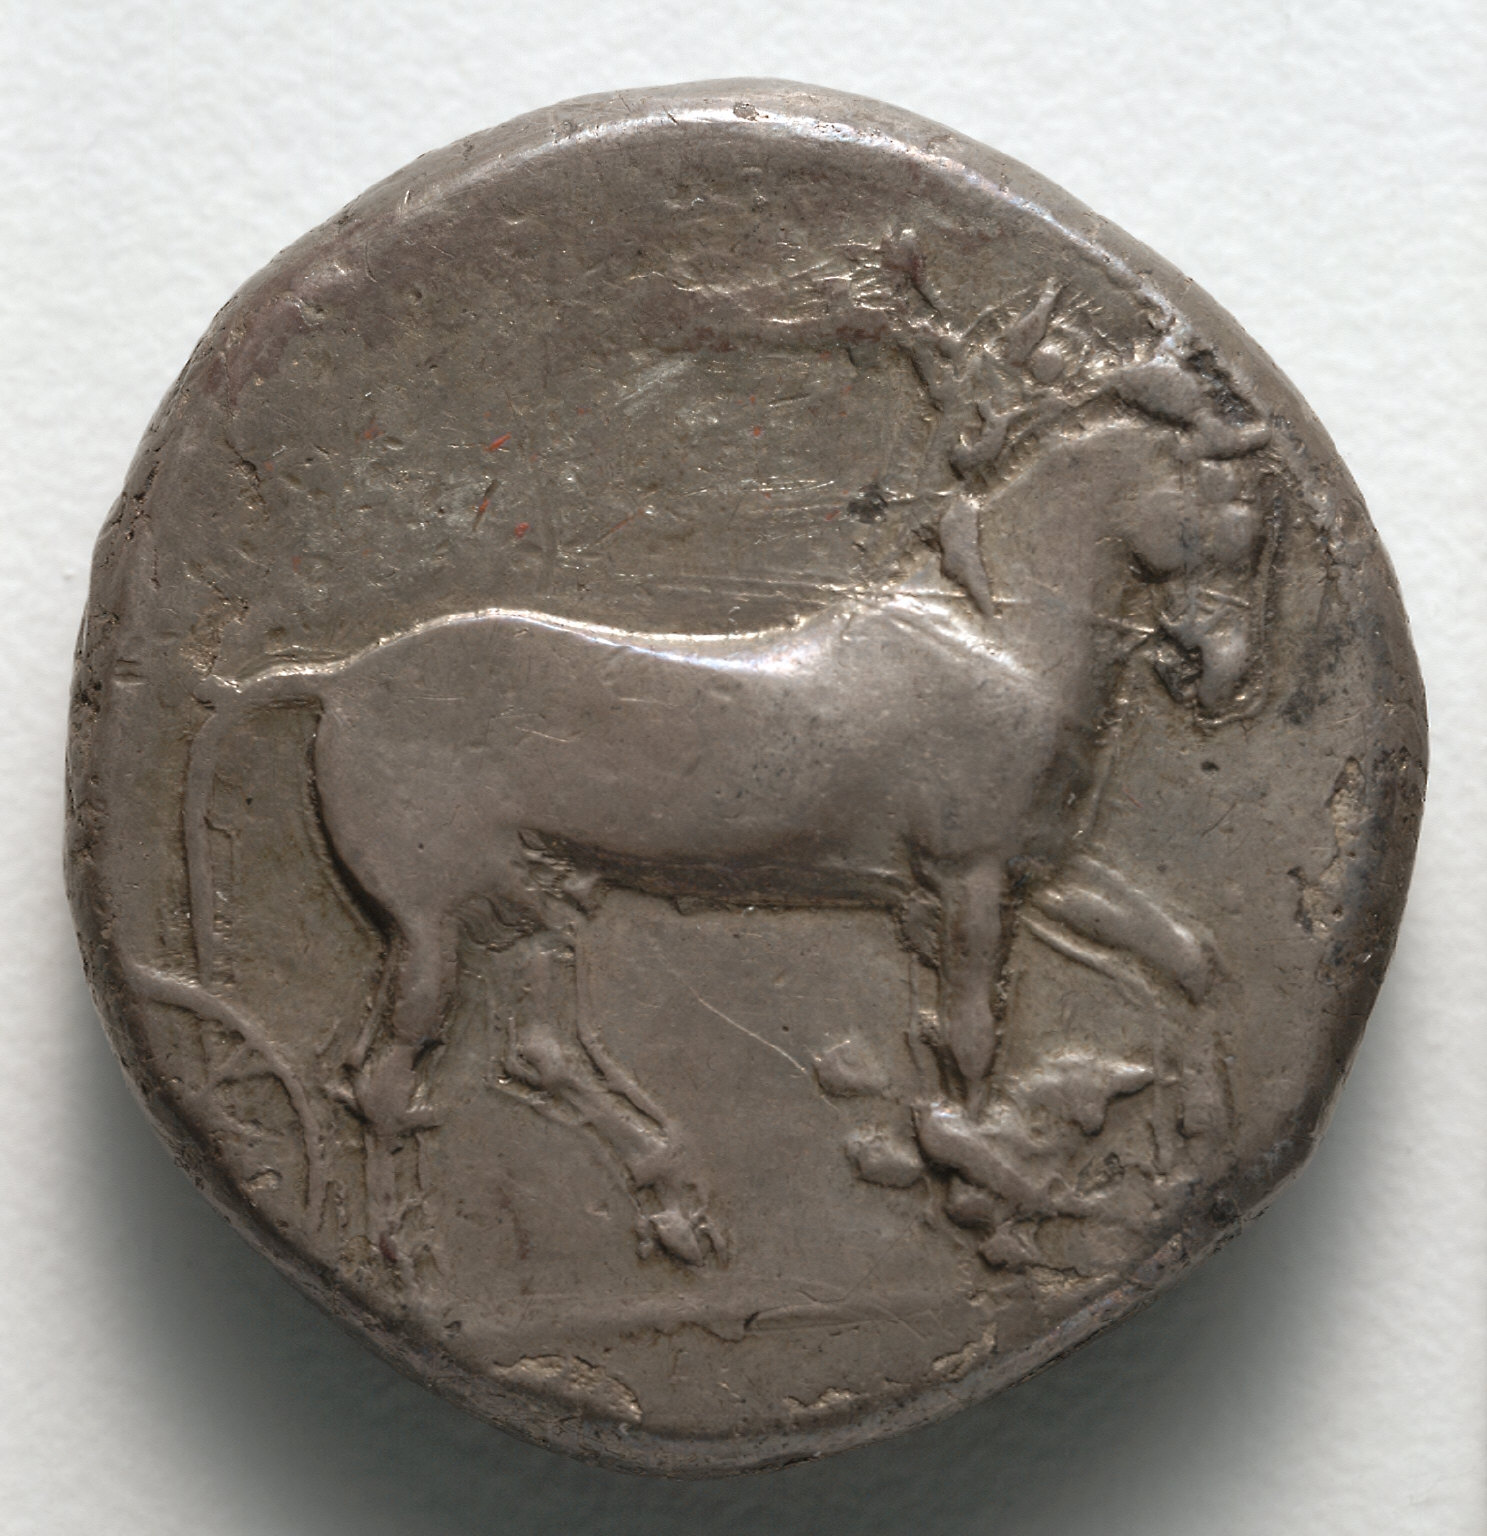 Tetradrachm: Quadriga Crowned by Victory (reverse)